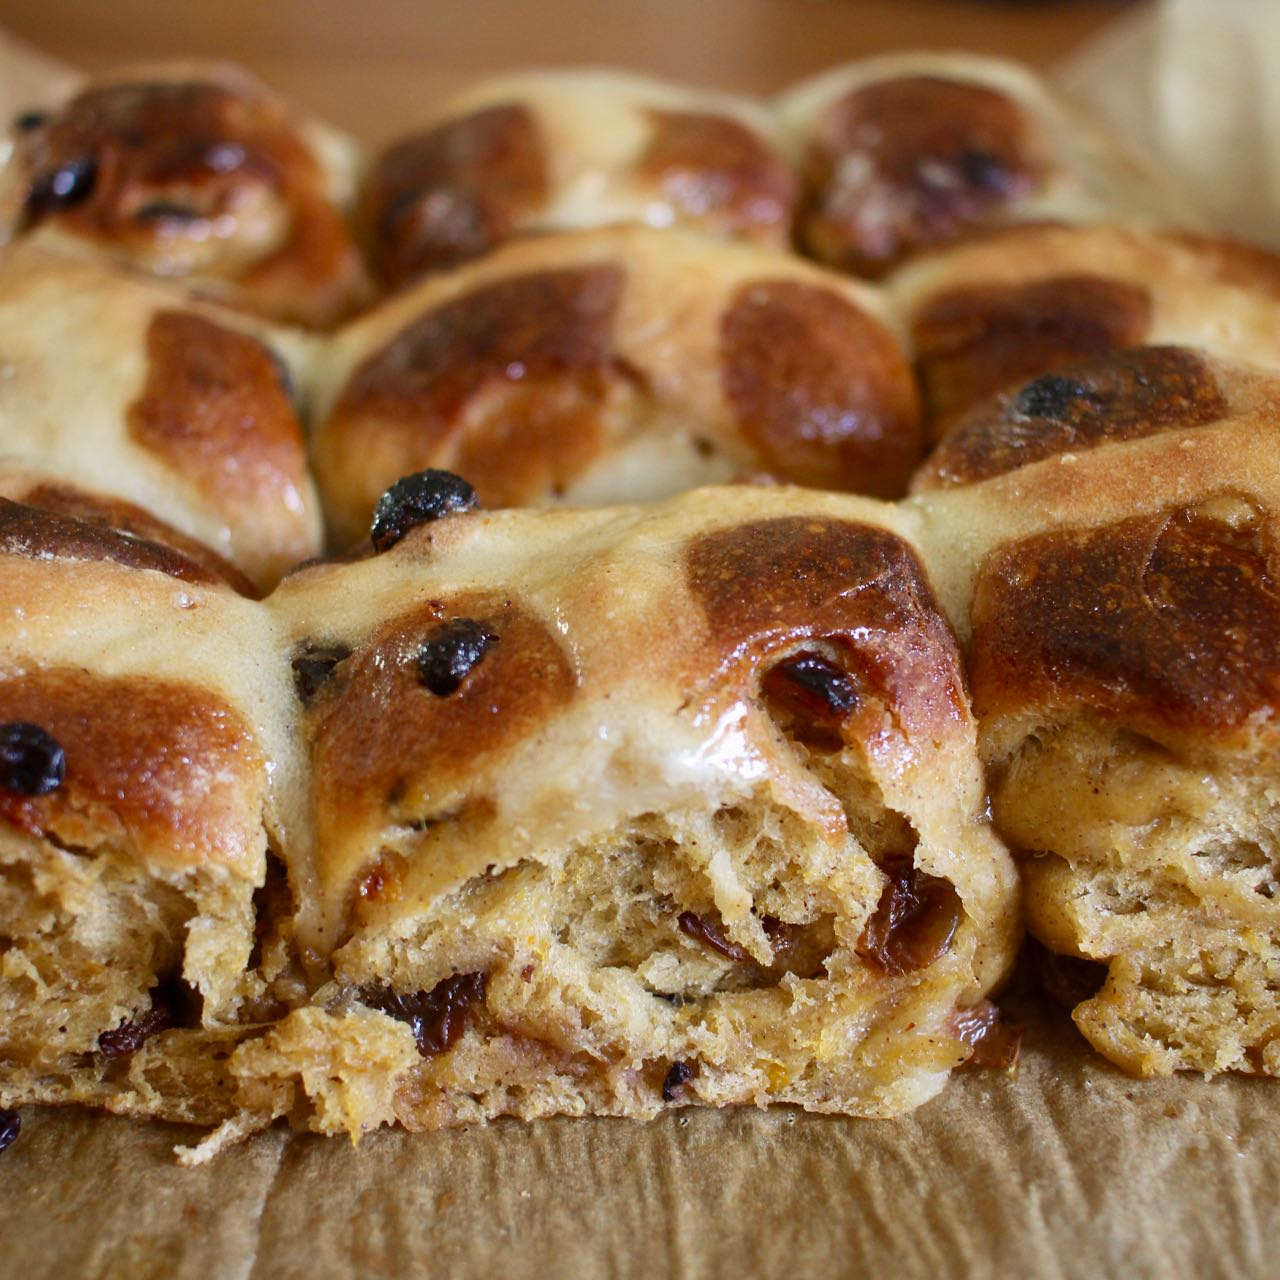 Nice buns sexy buns pastries